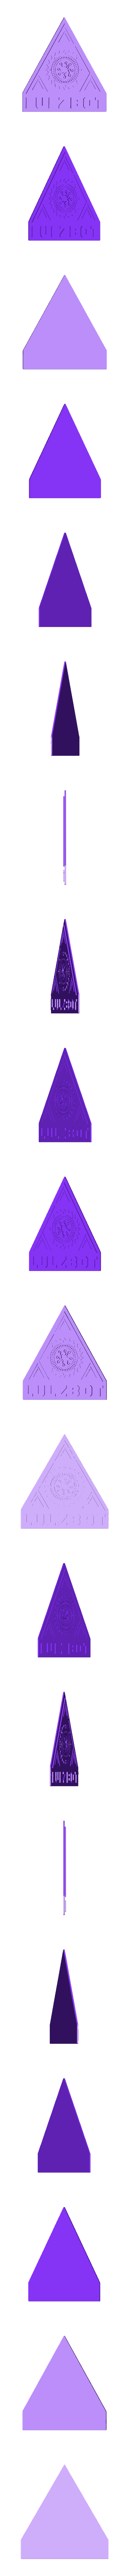 Lulzbot_logo_3_layers.stl Download free STL file Lulzbot Logo Layered for Single/Dual Extrusion • 3D print template, joshcarter